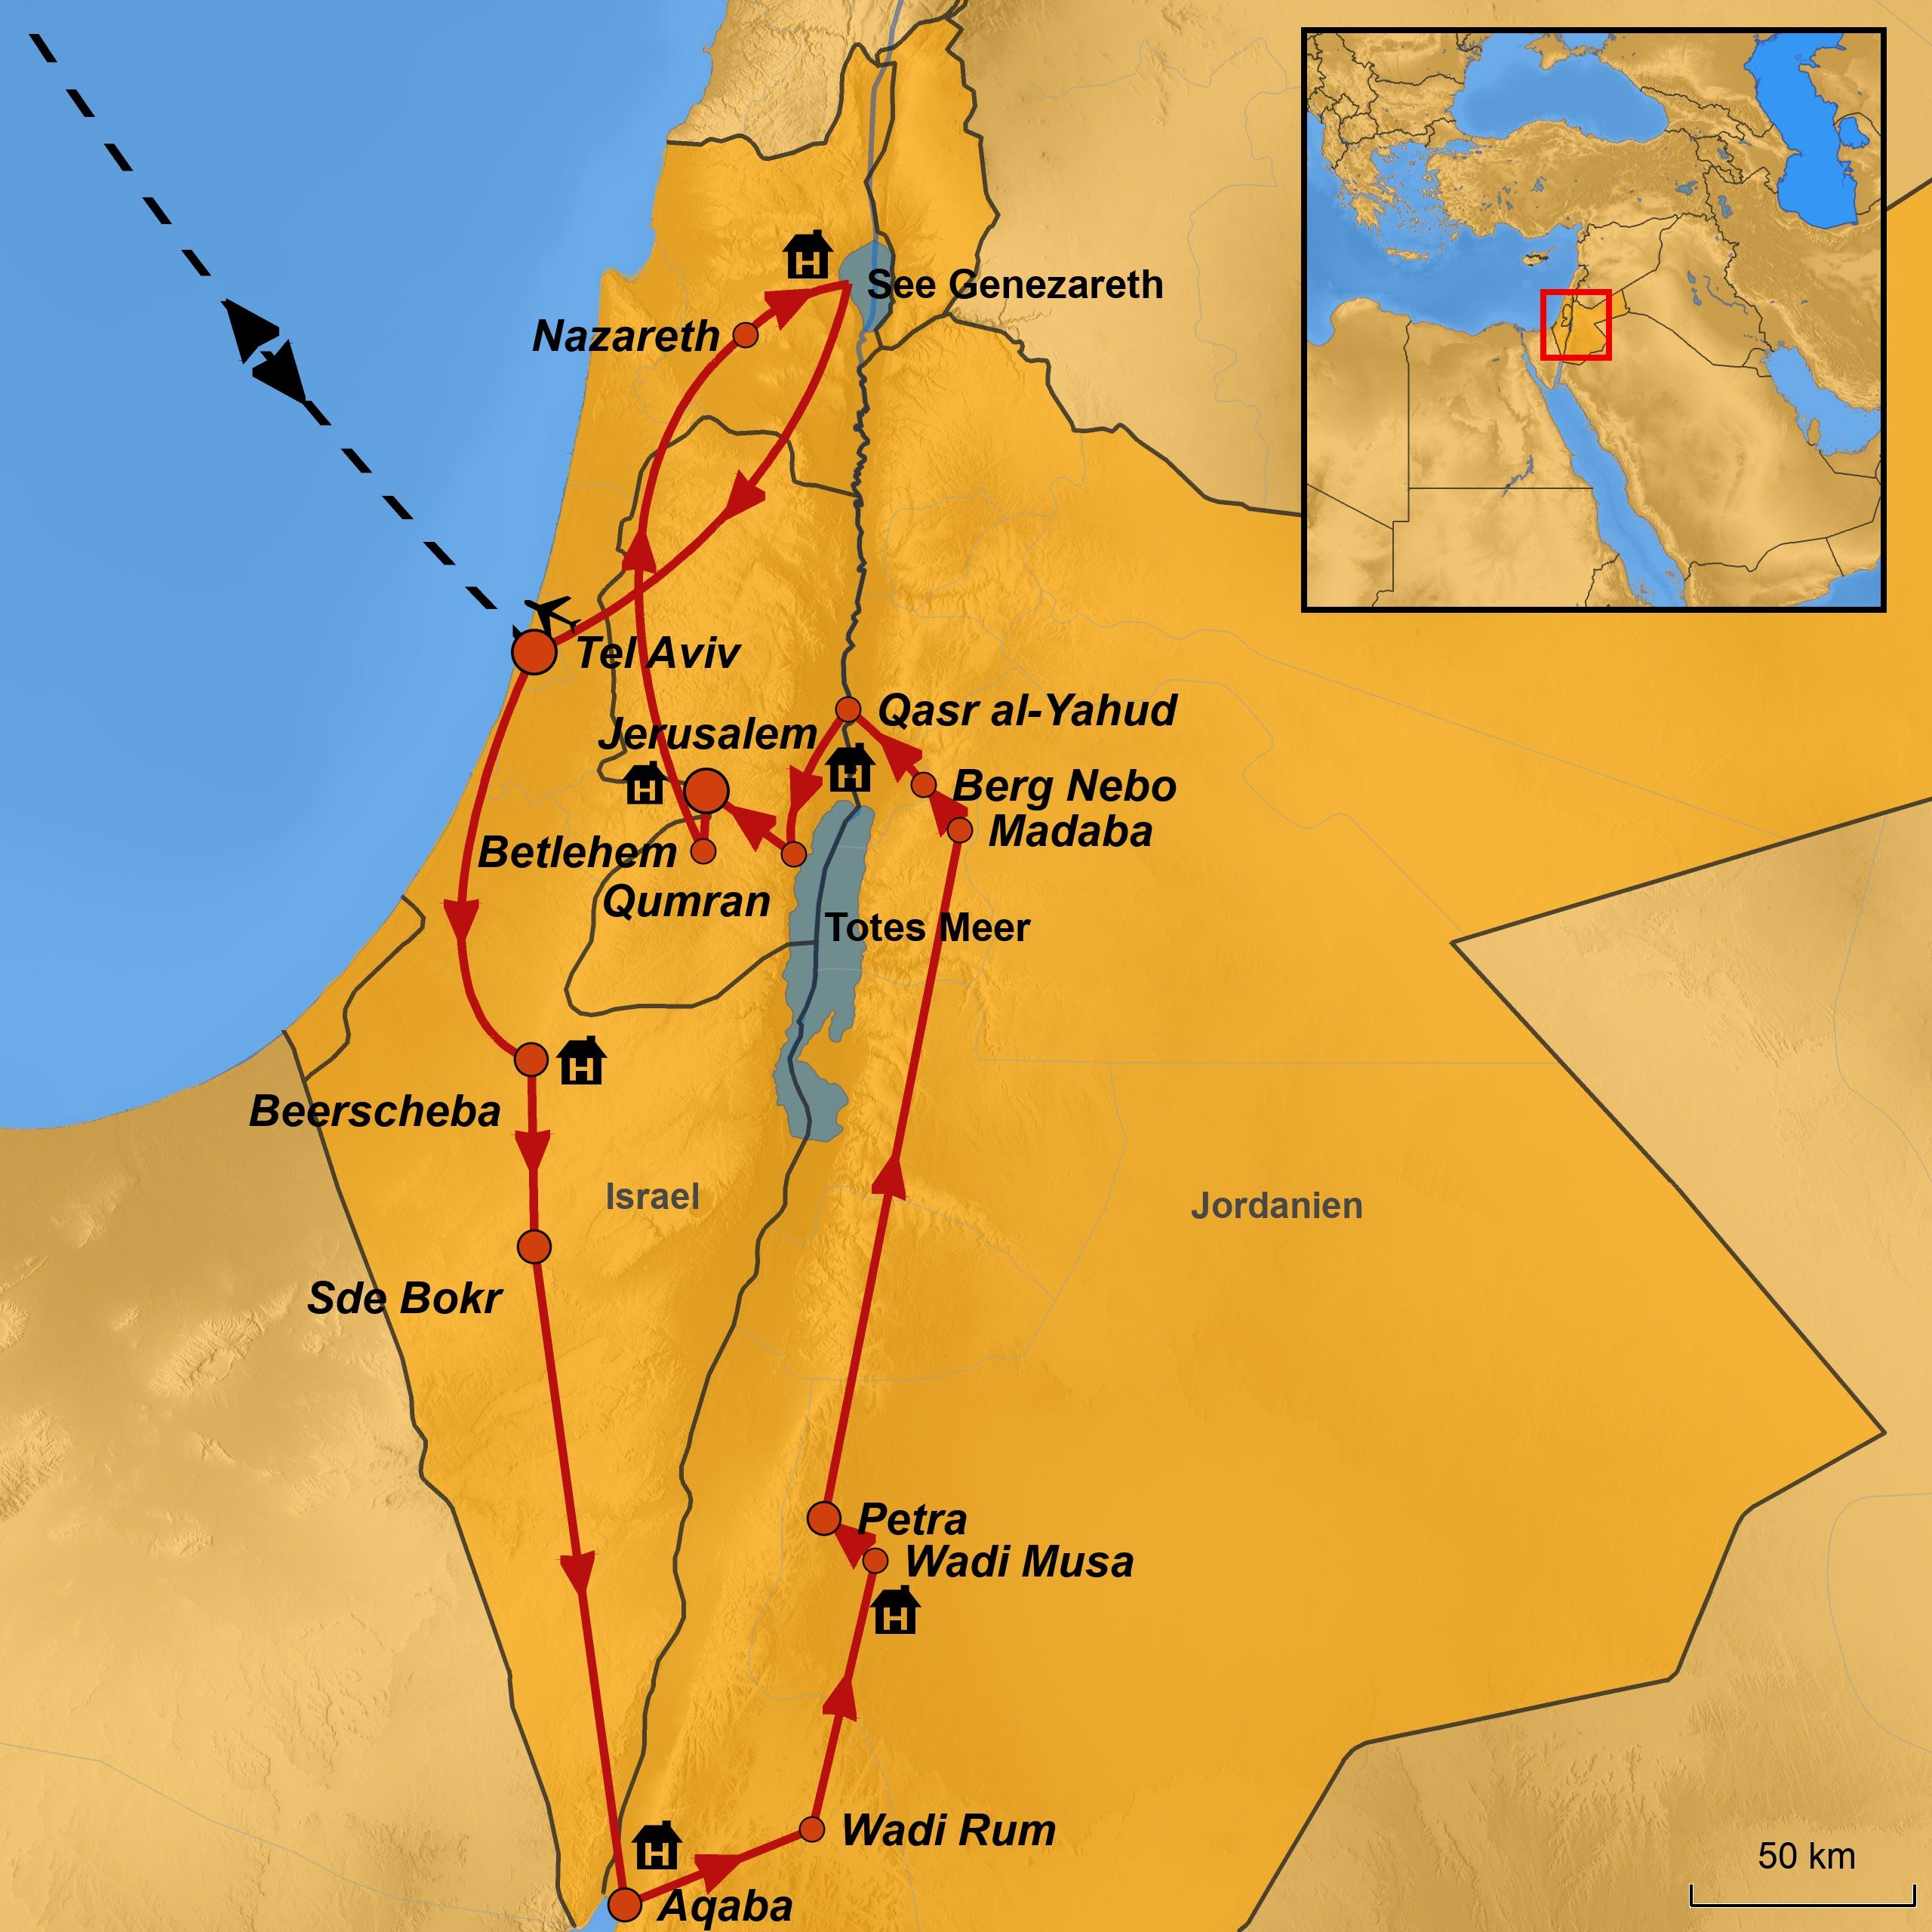 Jordanien Karte.Pilgerreise Israel Jordanien Arche Noah Reisen Gruppenangebot